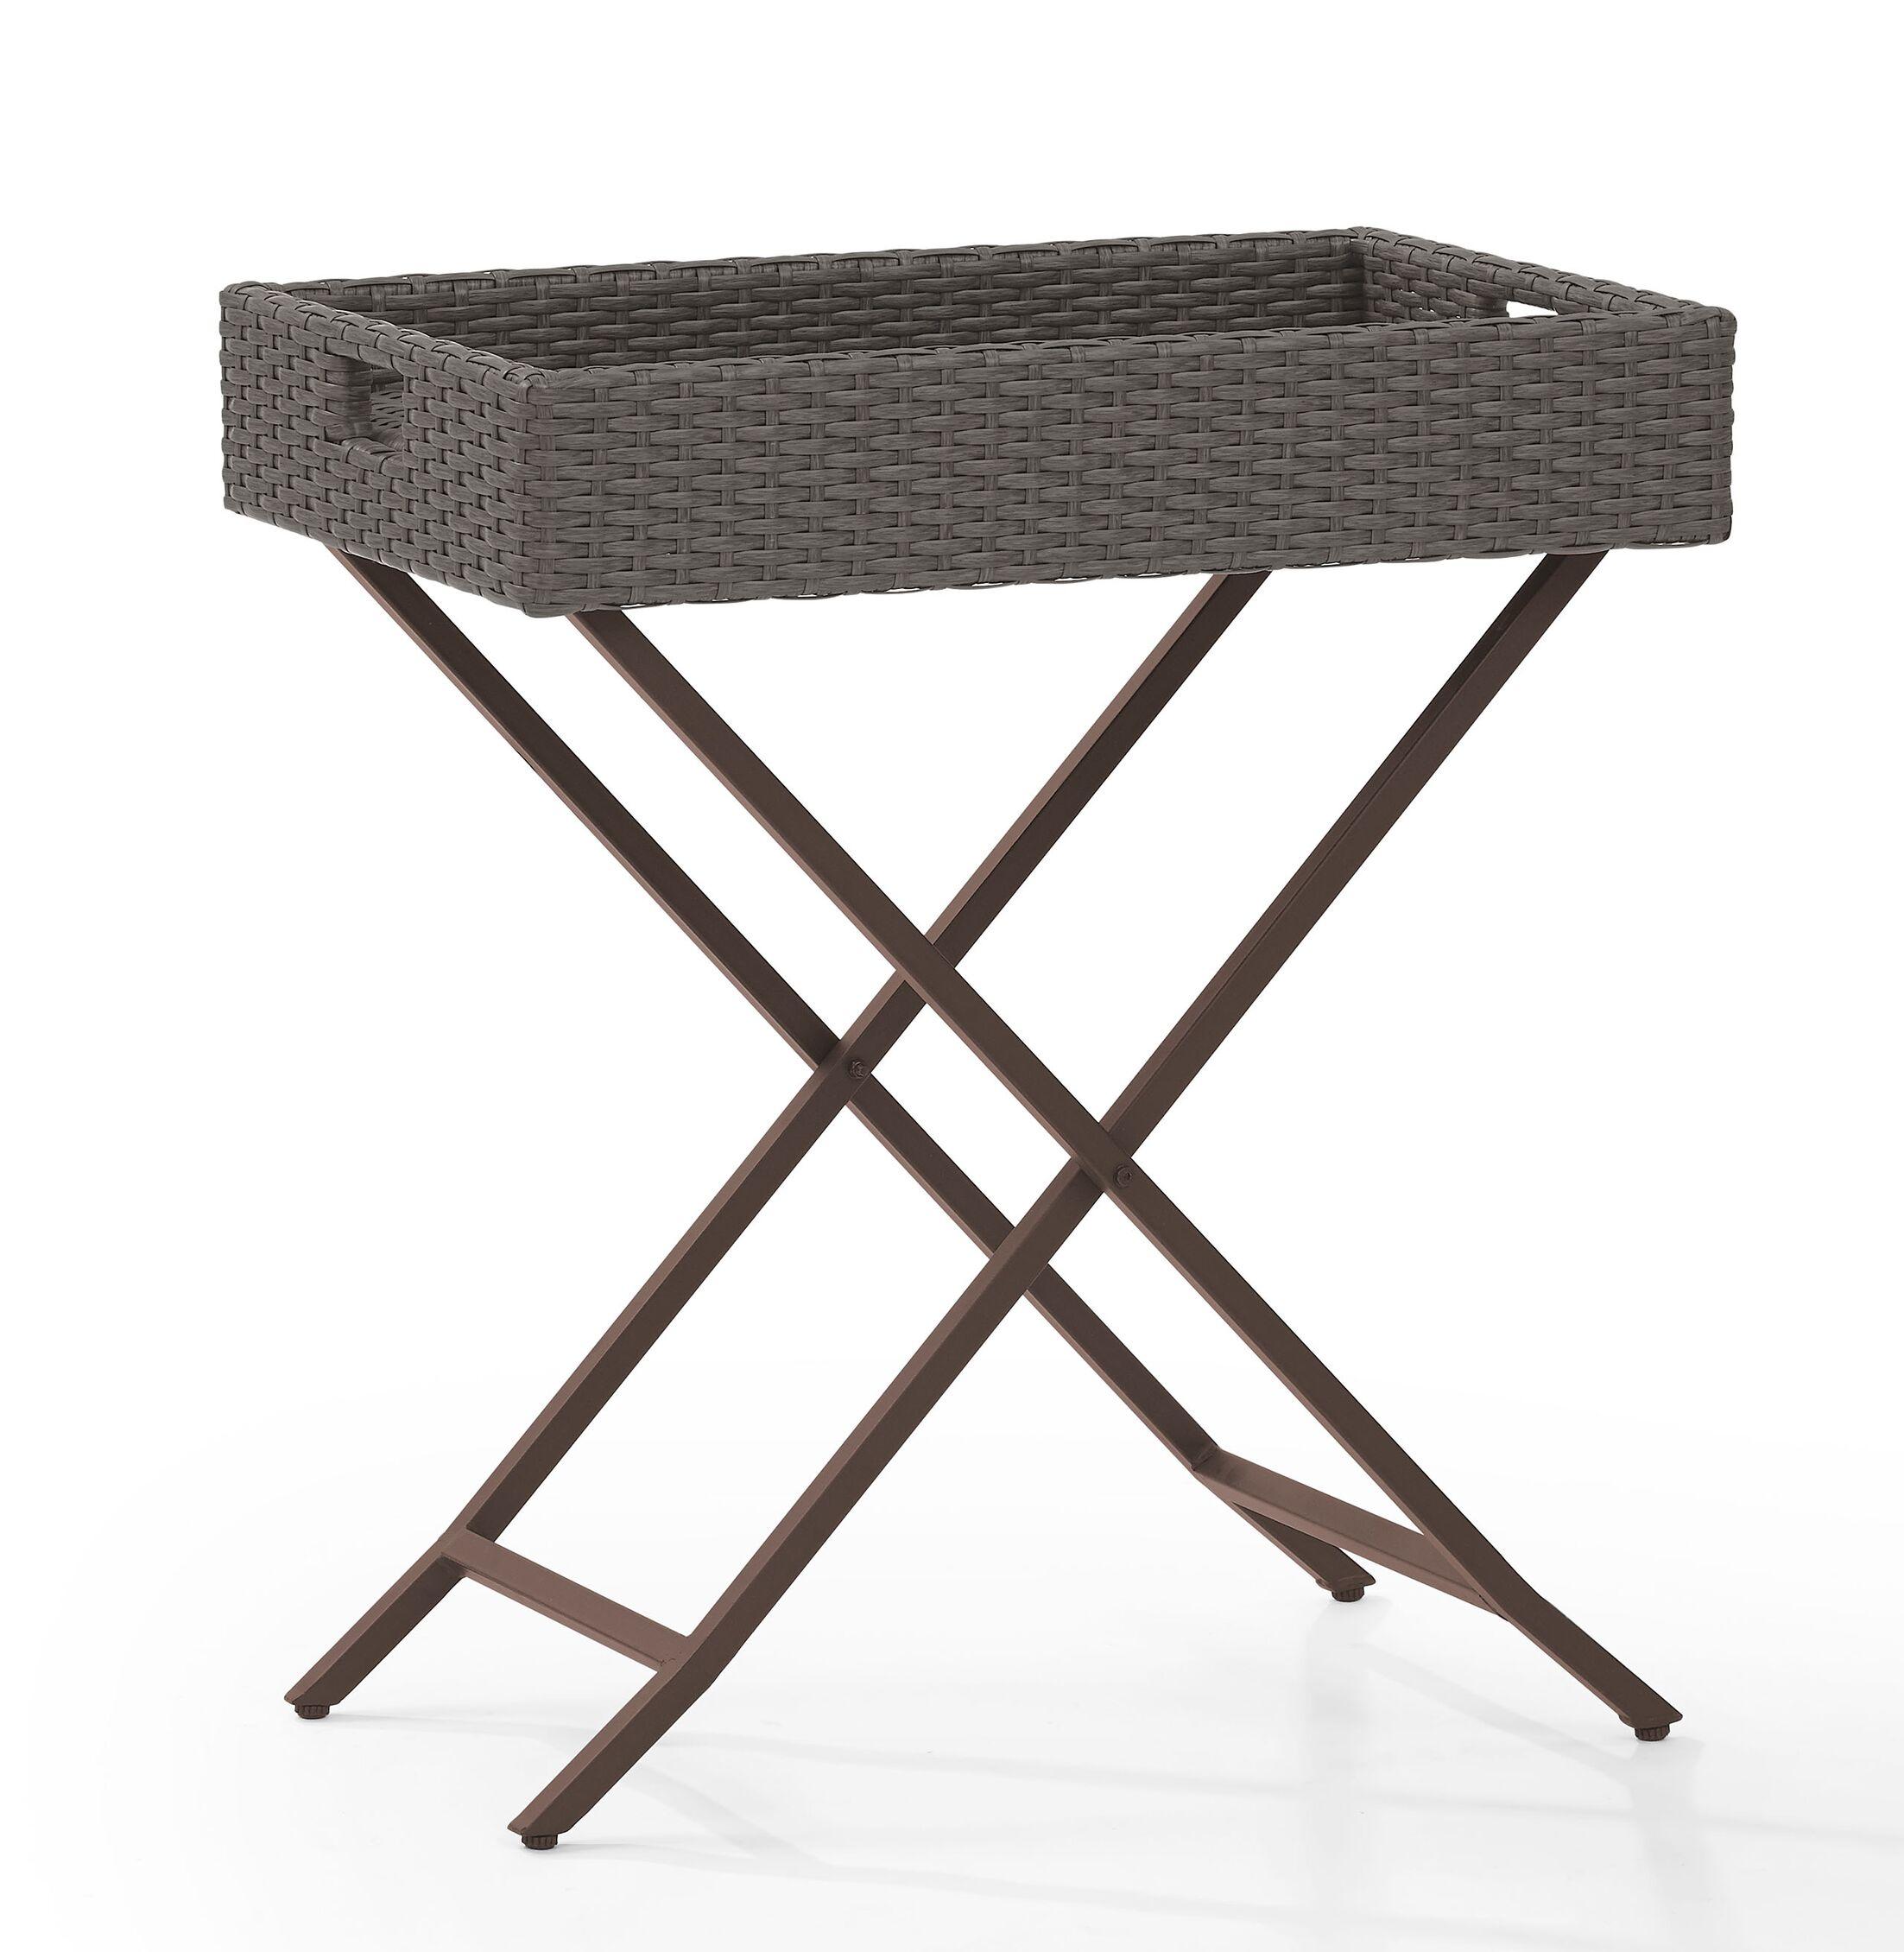 Brandy Tray Folding Wicker Bistro Table